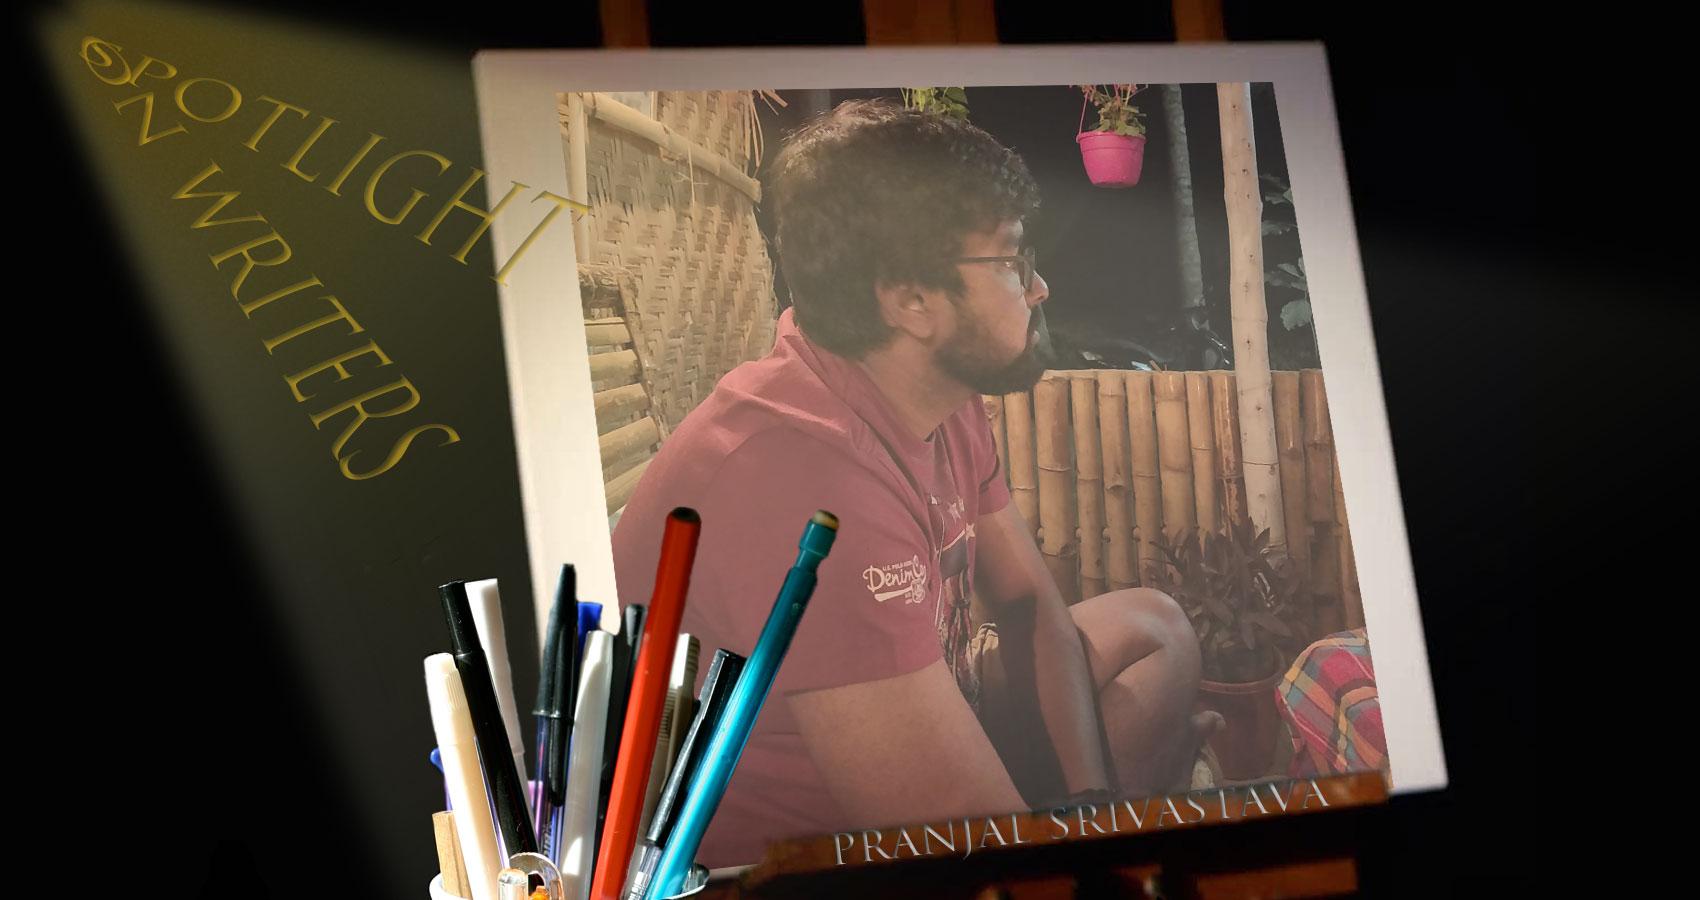 Spotlight On Writers - Pranjal Srivastava, an interview at Spillwords.com